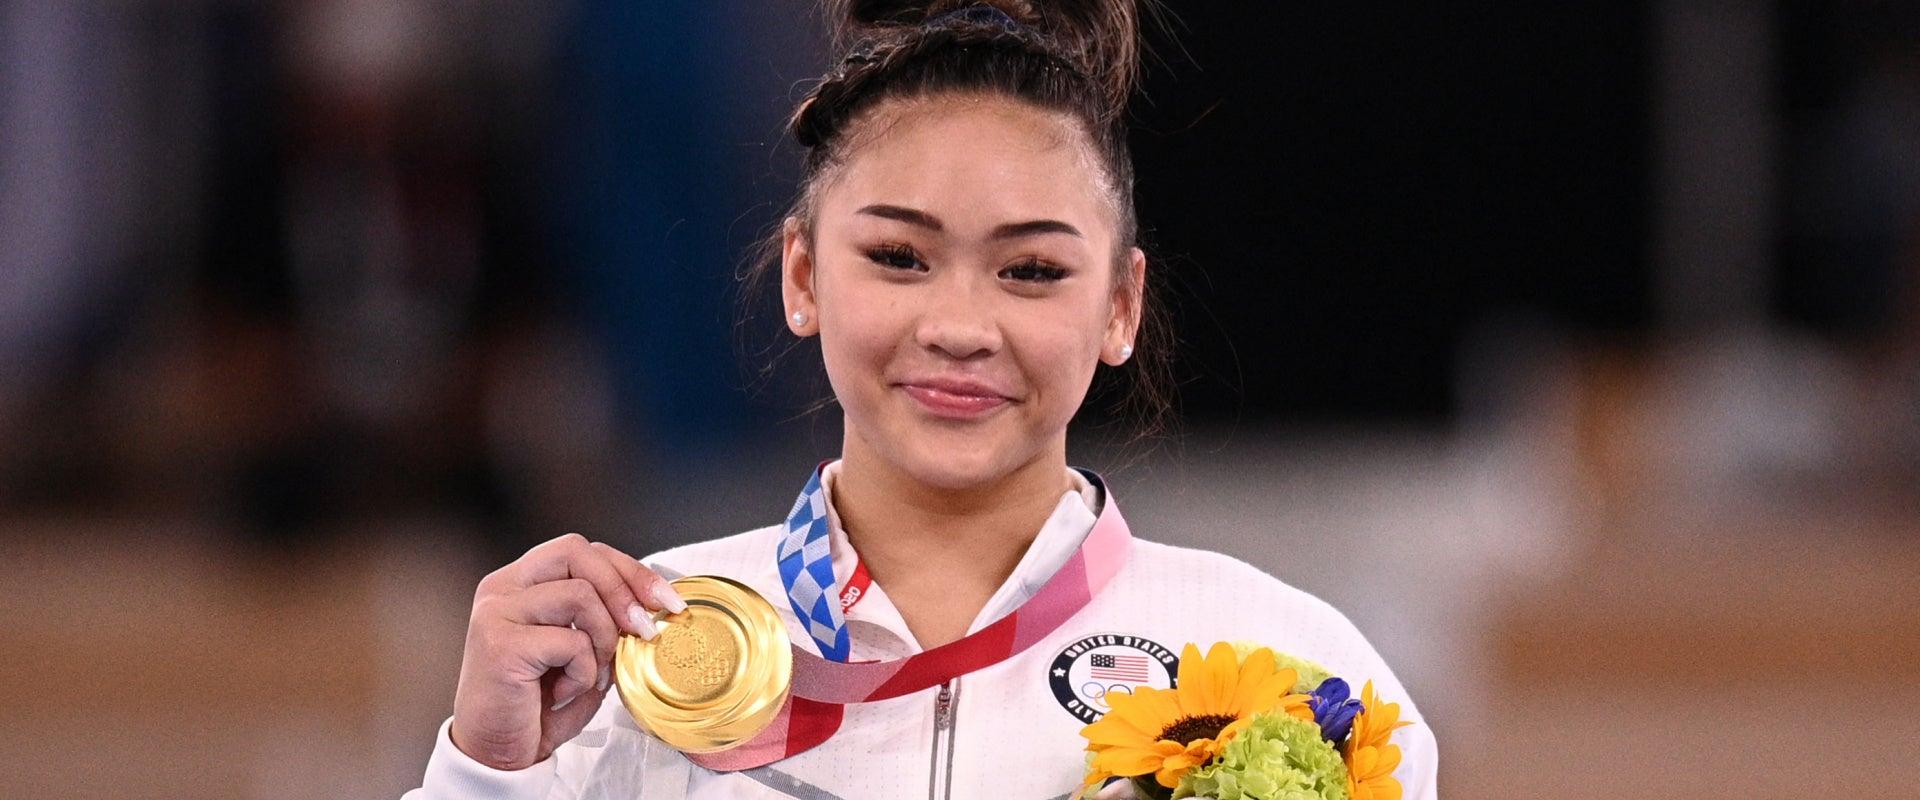 suni lee tokyo olympics